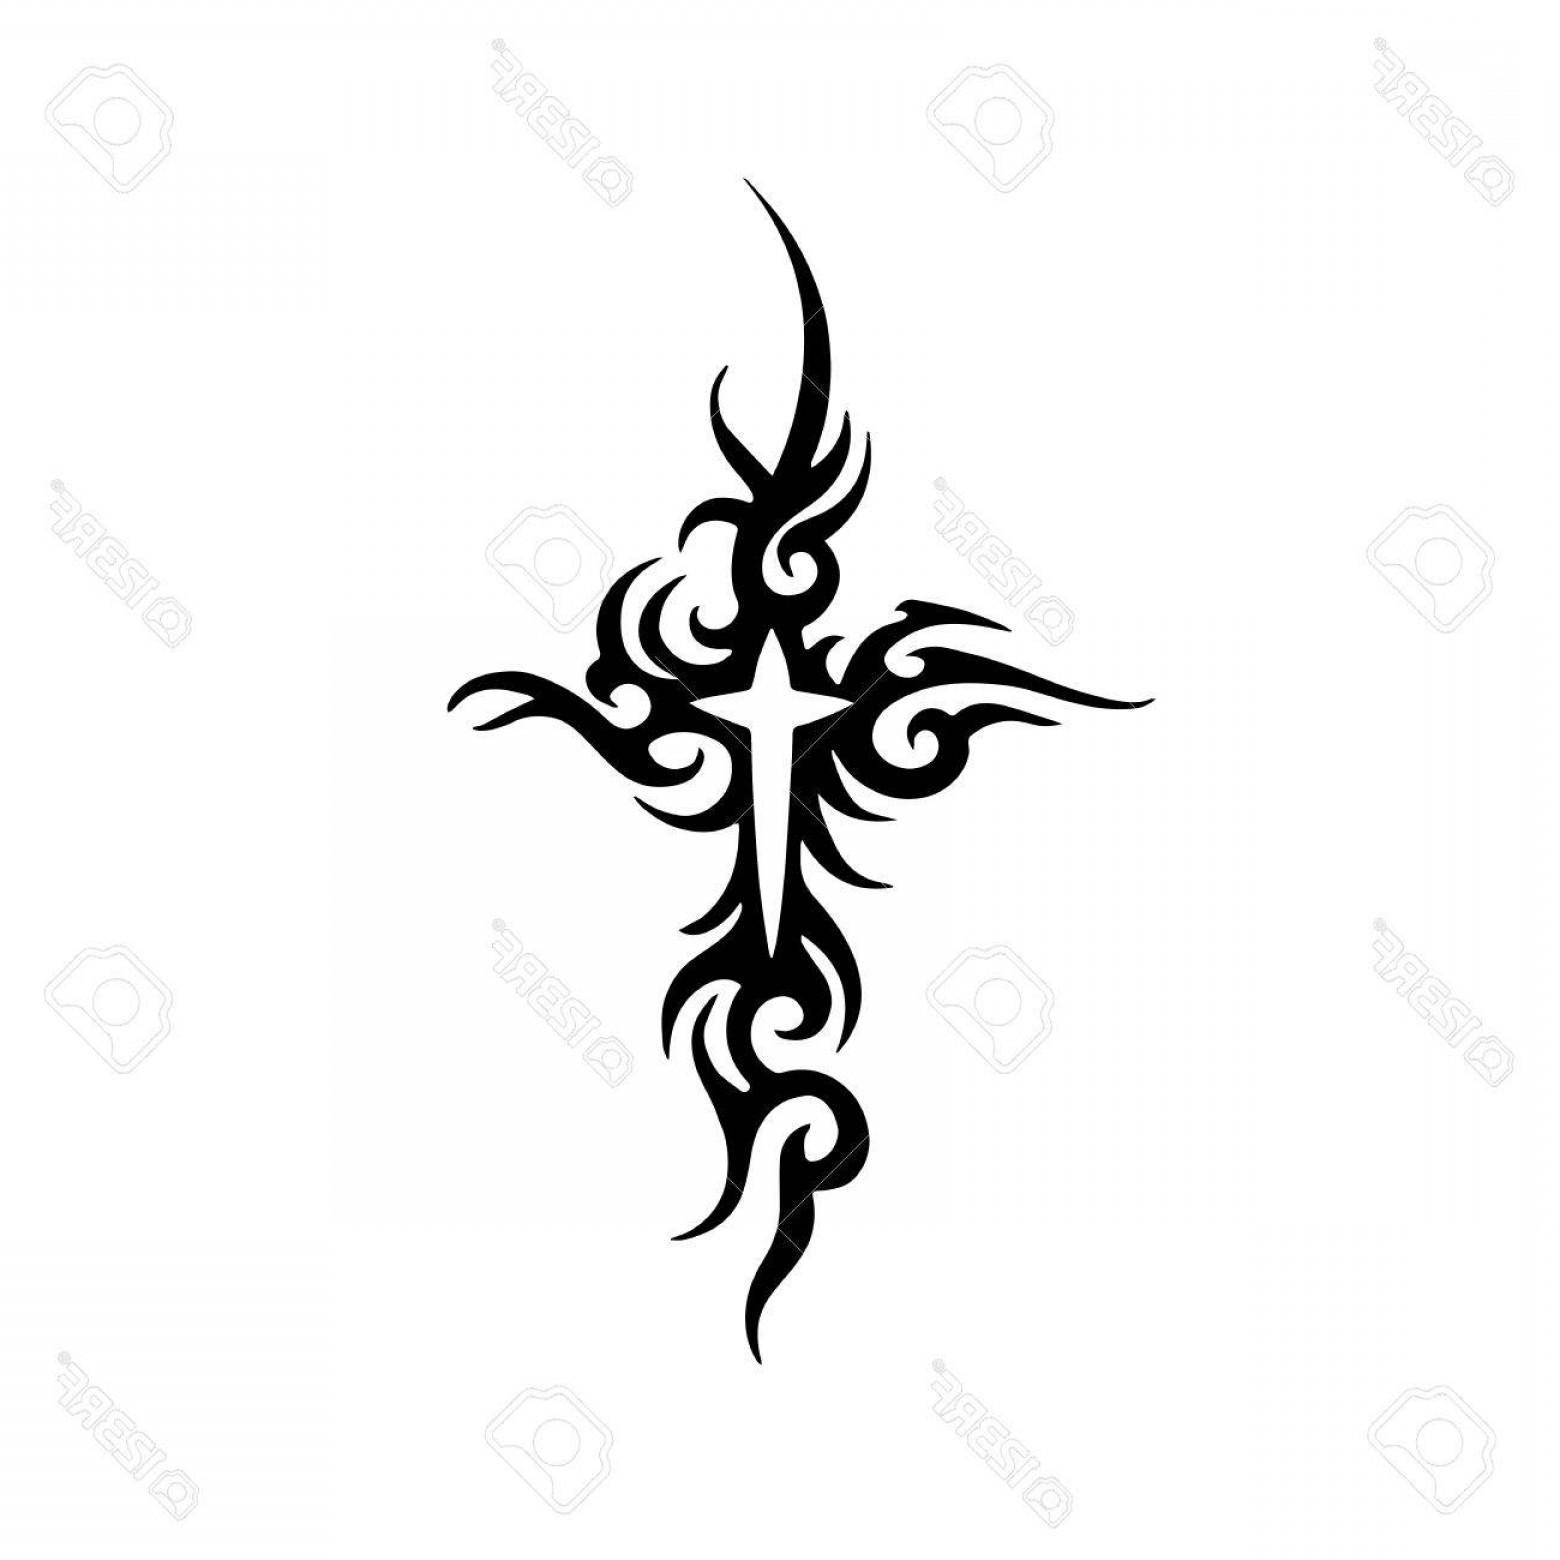 1560x1560 Photostock Vector Tribal Cross Tattoo Design Shopatcloth